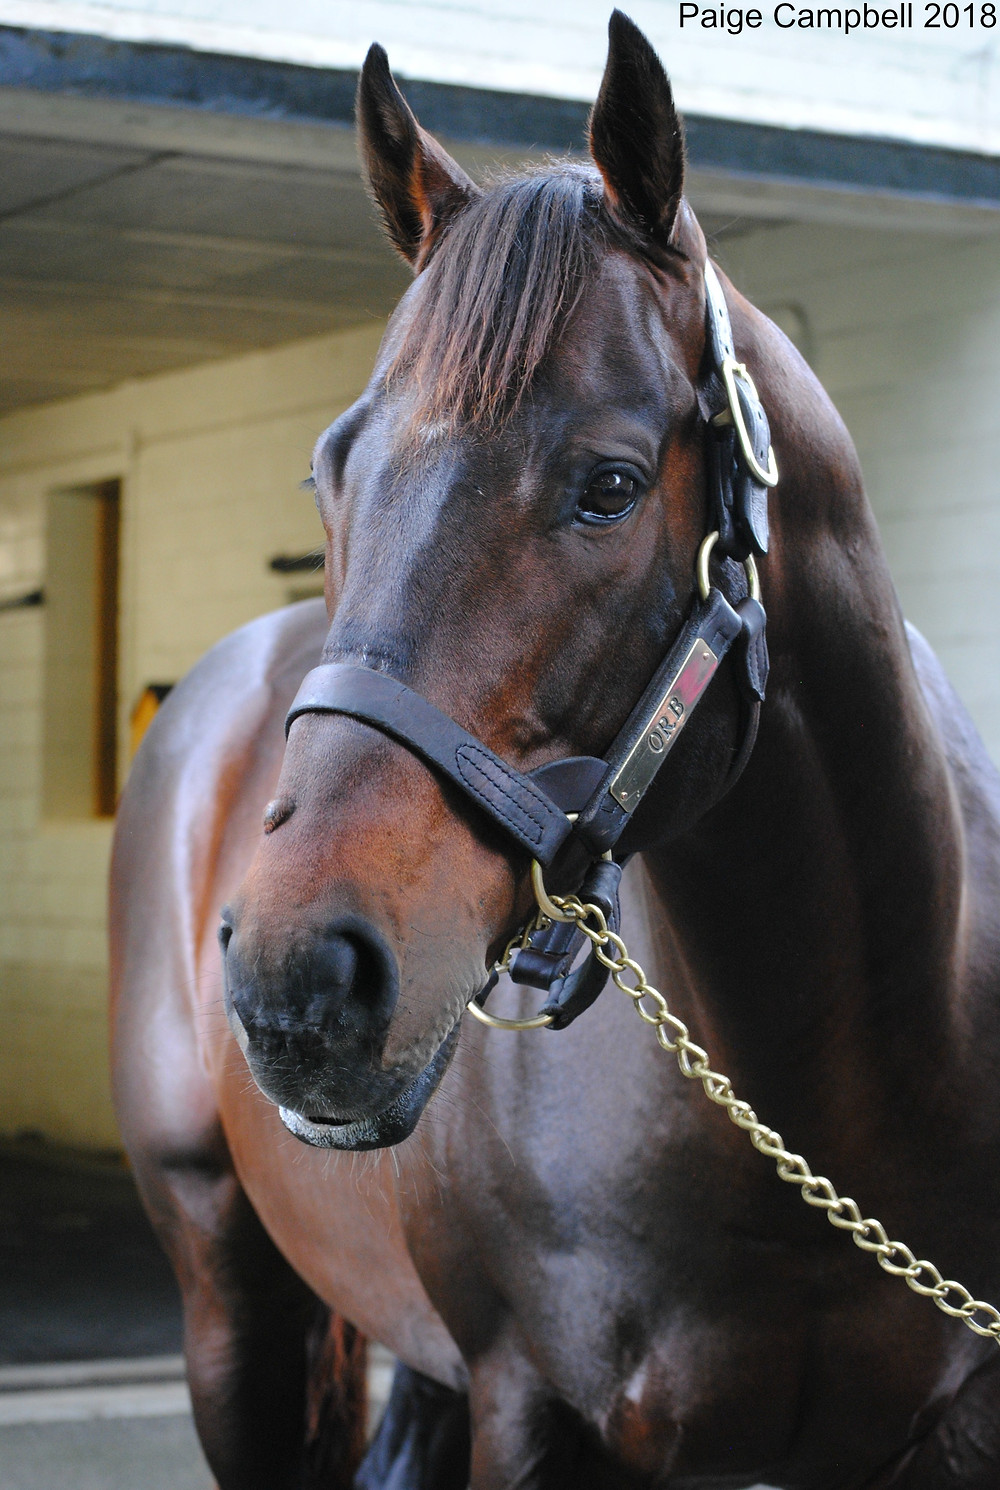 Orb, 2013 Kentucky Derby winner, at Claiborne Farm.